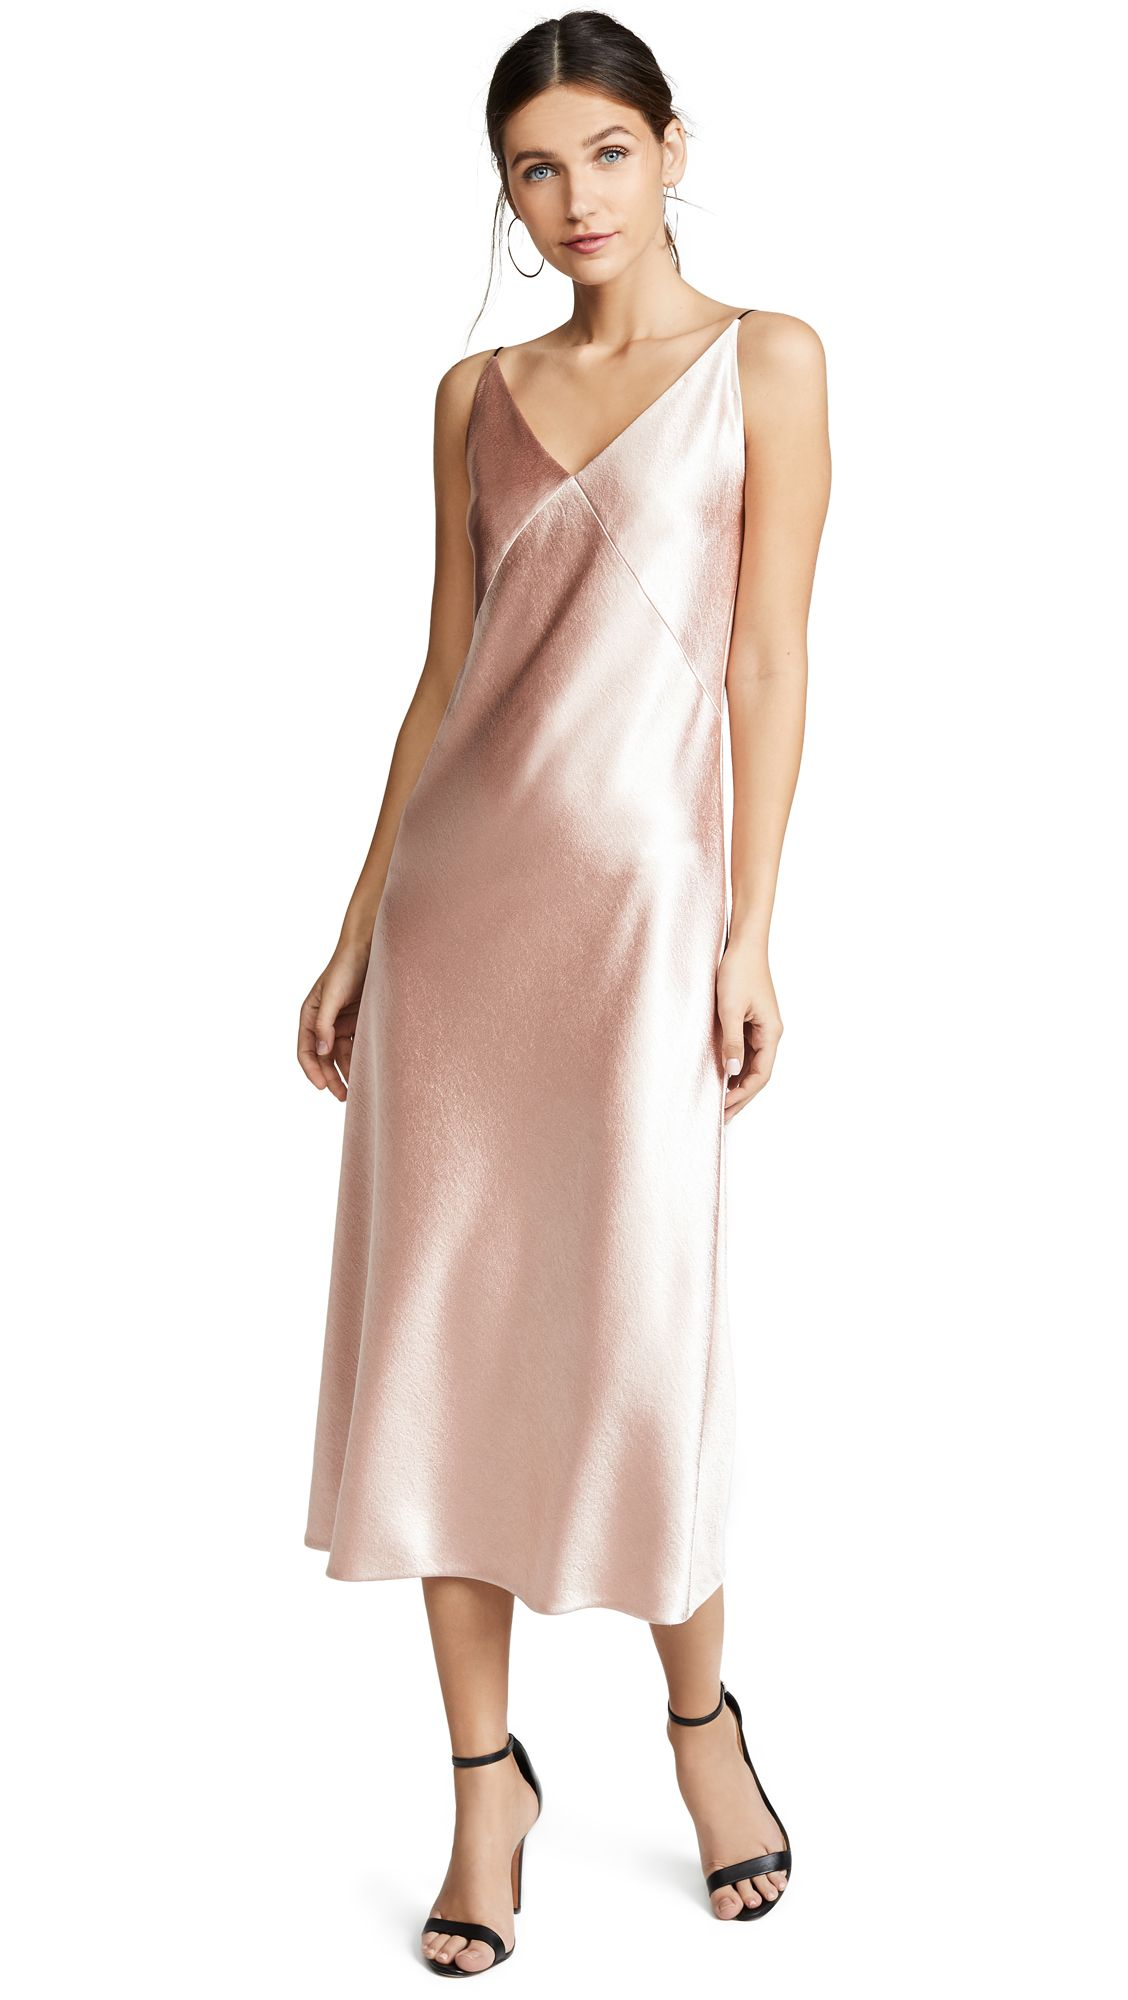 b7779750b5f V-Neck Bias Dress by Vince in Blush in 2019